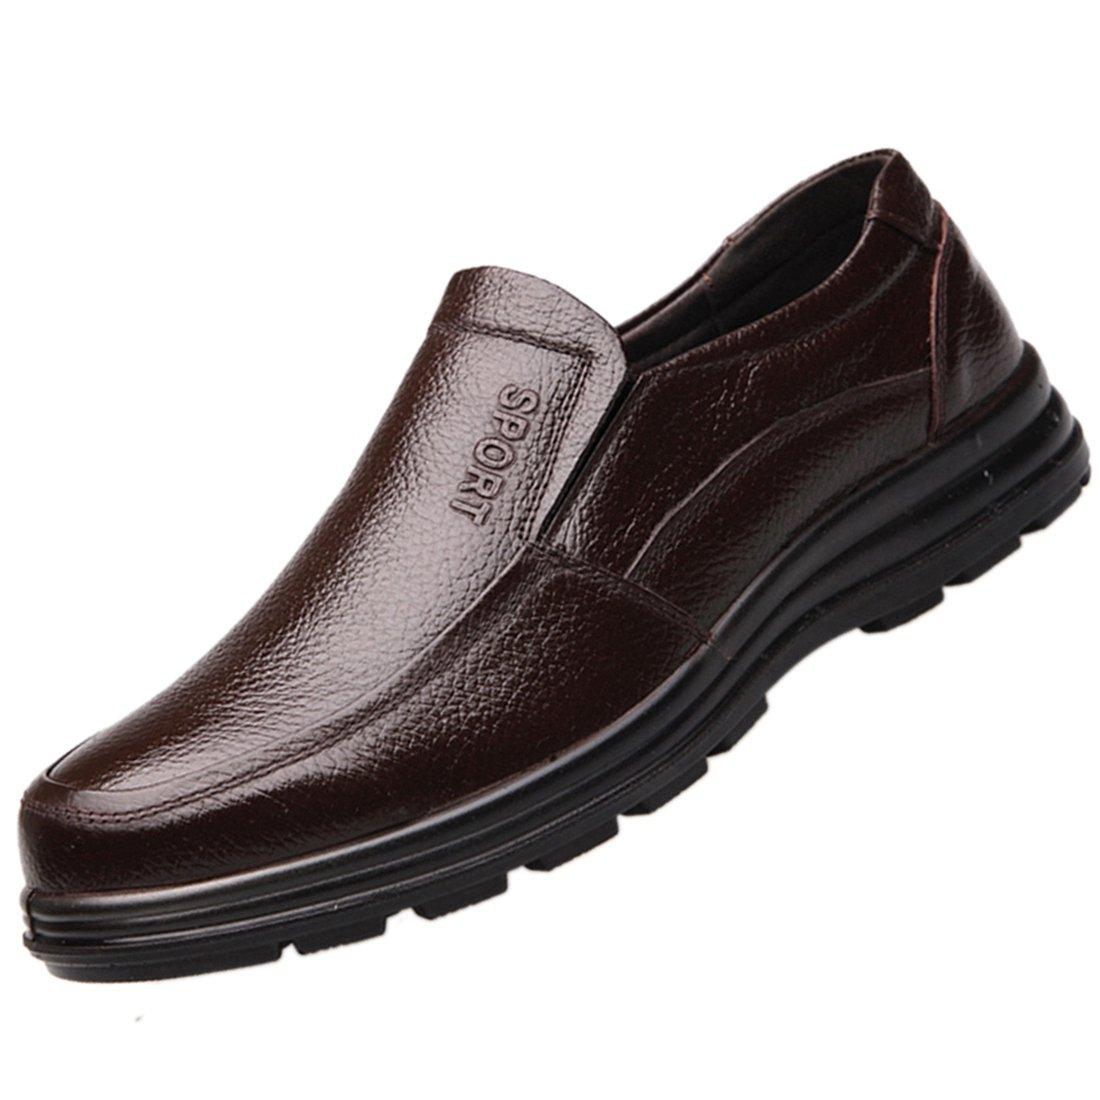 Enerhu Men Slip on Work Shoe Flat Chef Shoes Leather Wear Resistant Oilproof Waterproof Brown Asian 44/US 9.5